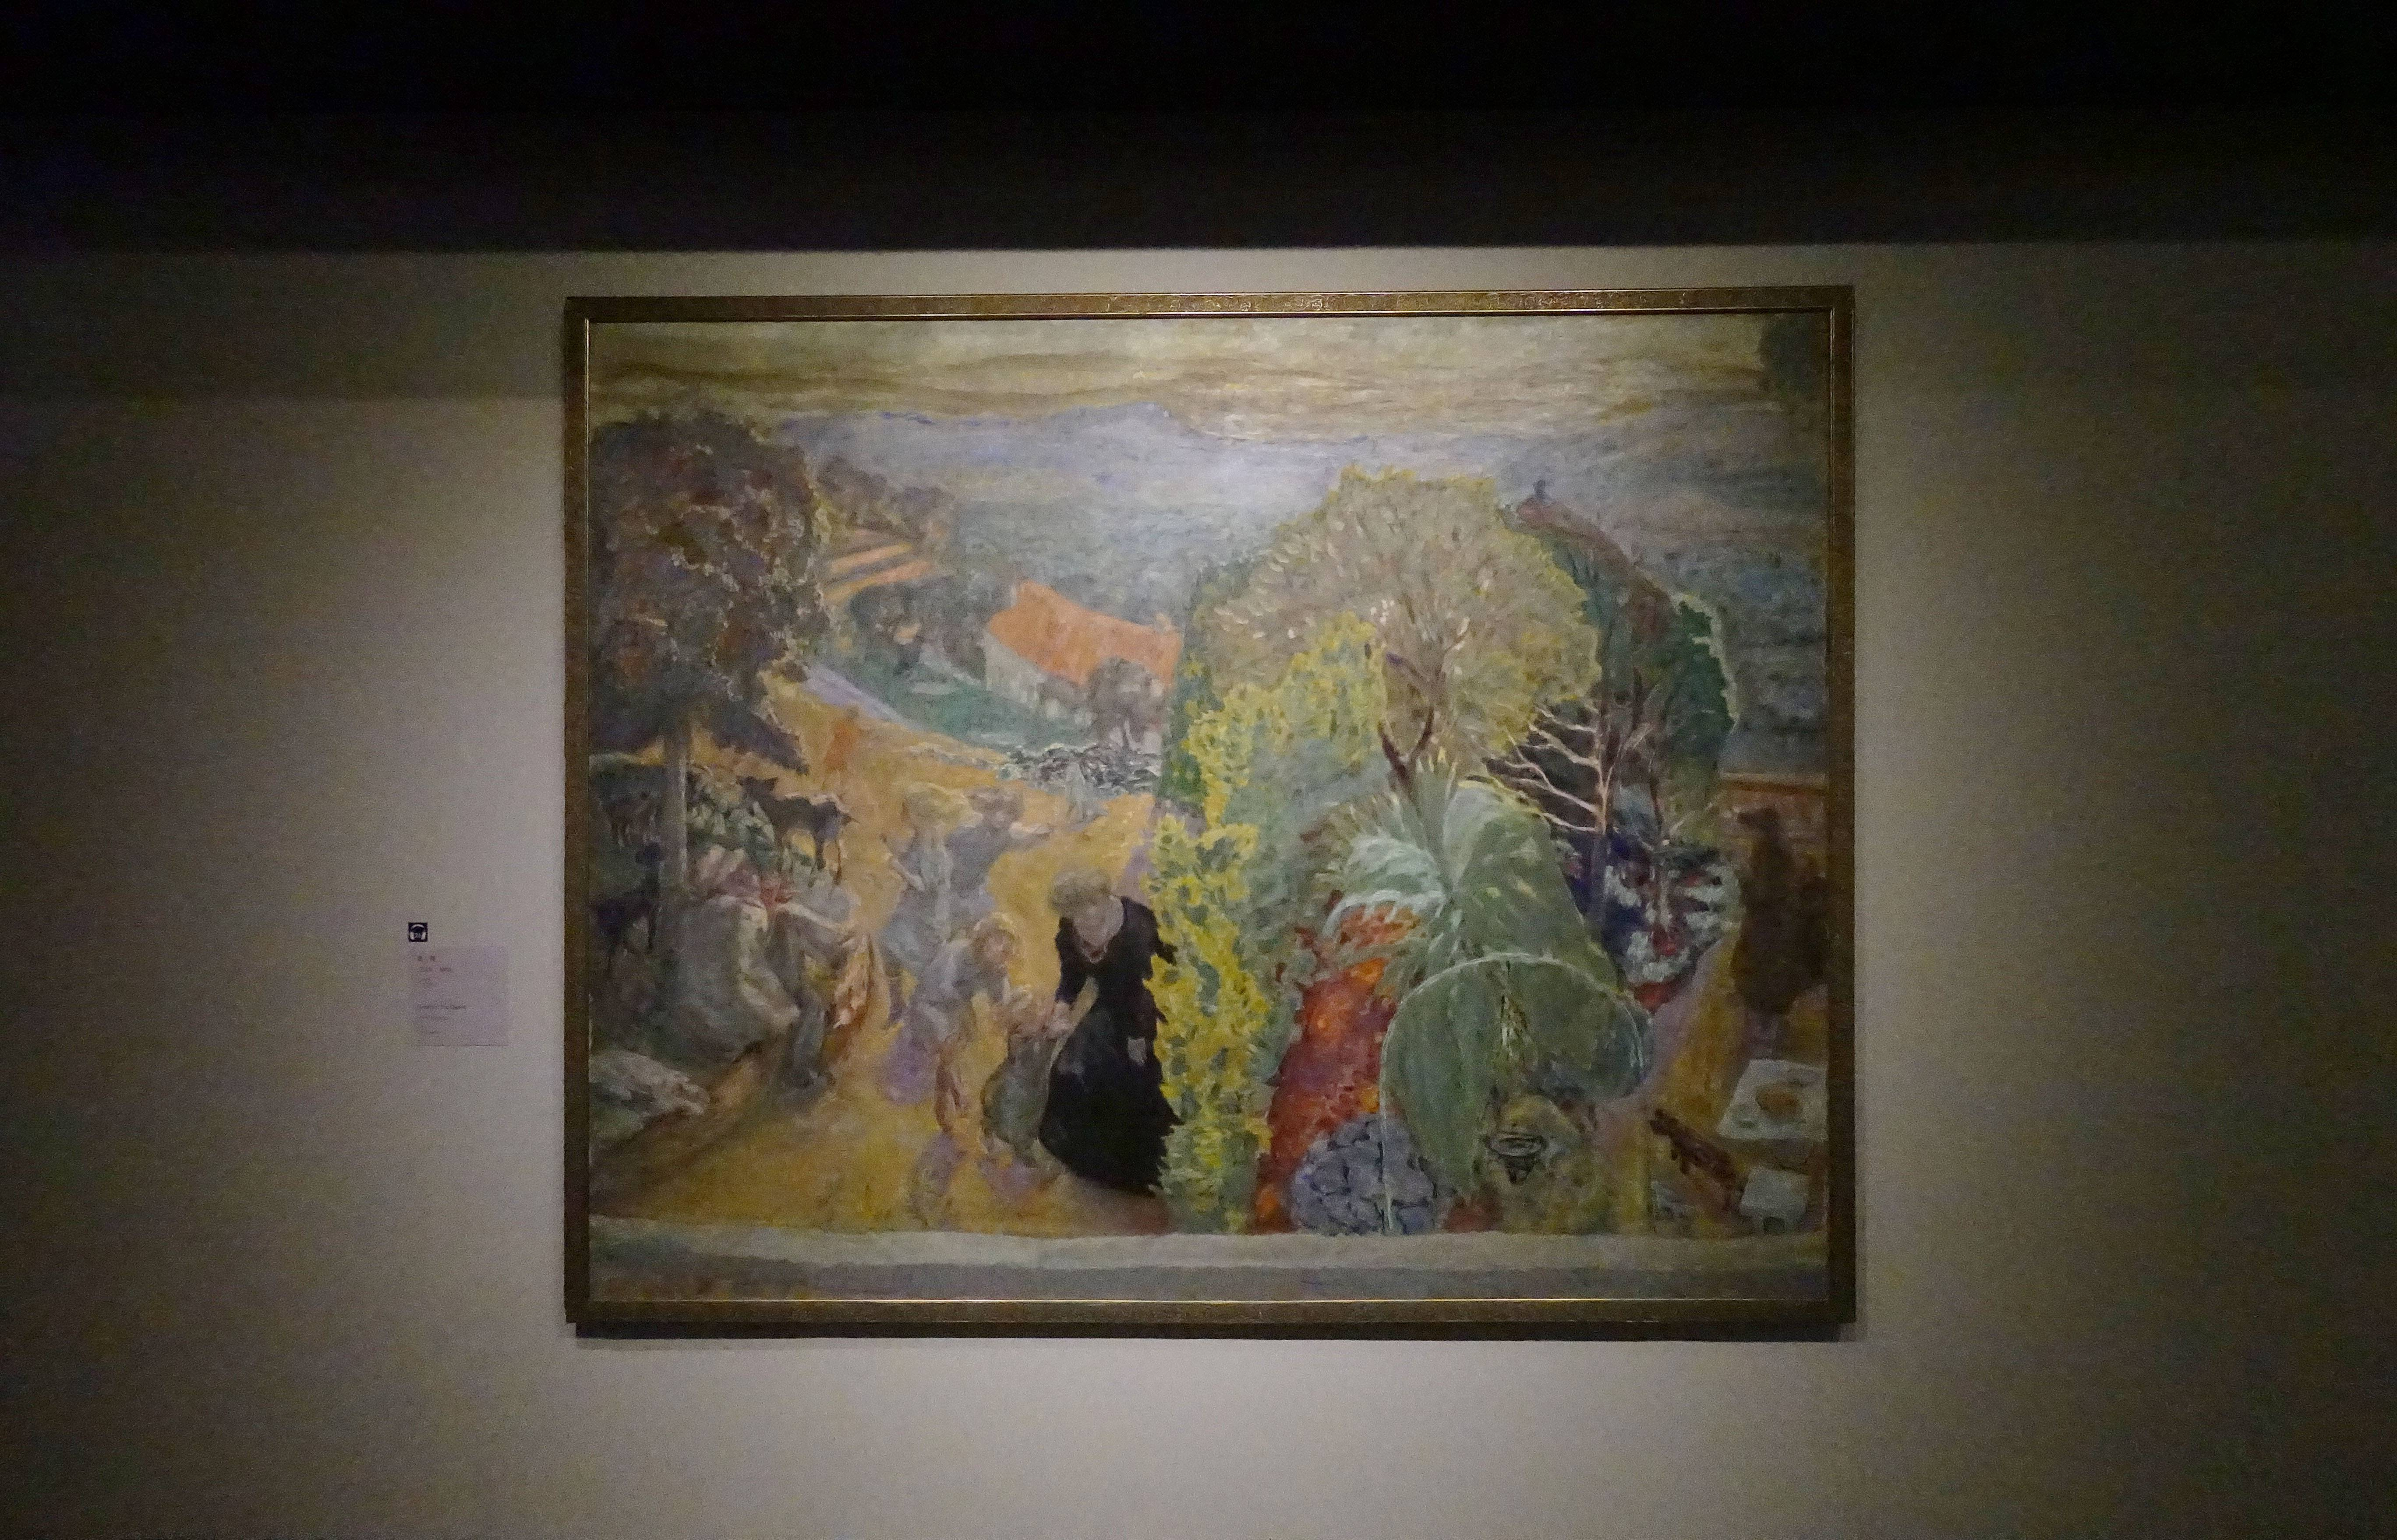 皮埃爾.波納爾 Pierre Bonnard ,《夏之舞 Summer: The Dance》,油彩、畫布 Oil on canvas。